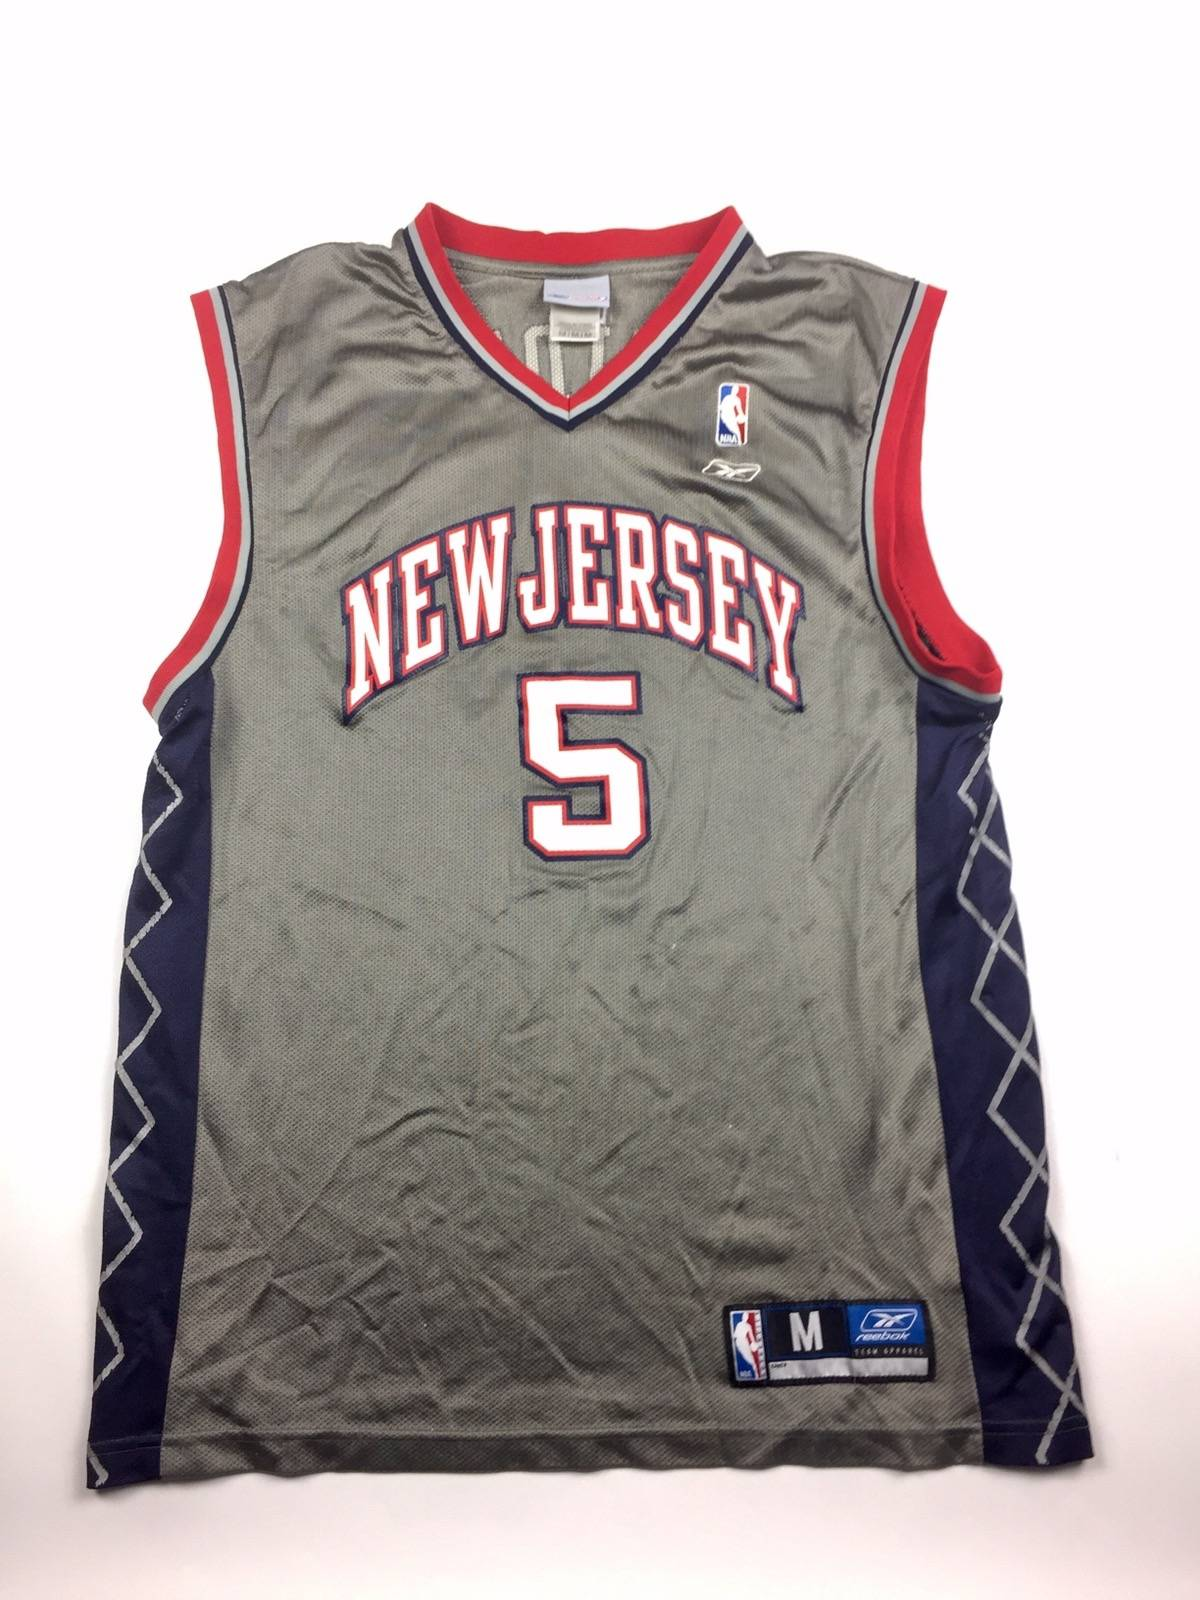 944418dc77e Reebok Vintage Reebok Nba New Jersey Nets Jason Kidd Basketball Jersey